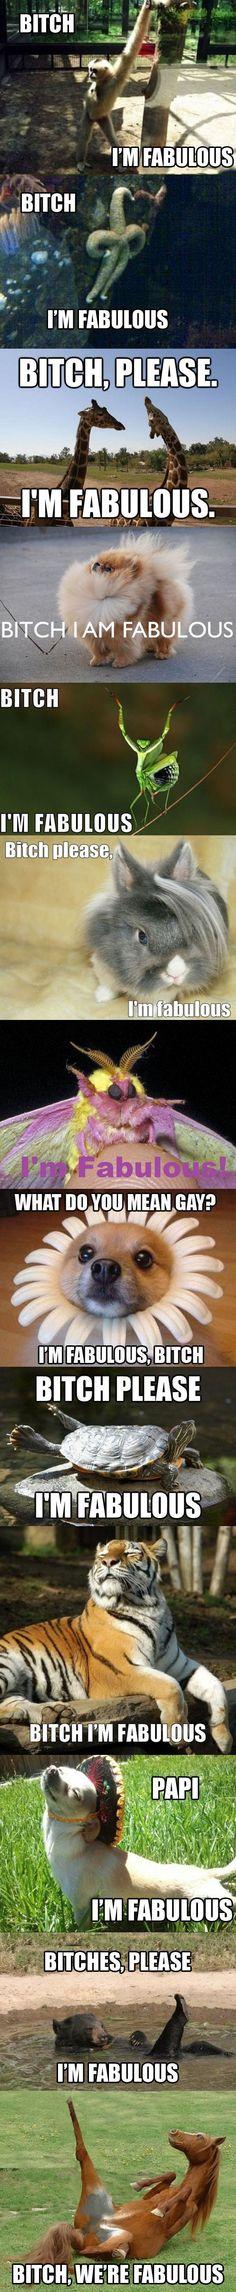 Fabulous animals are FABULOUS